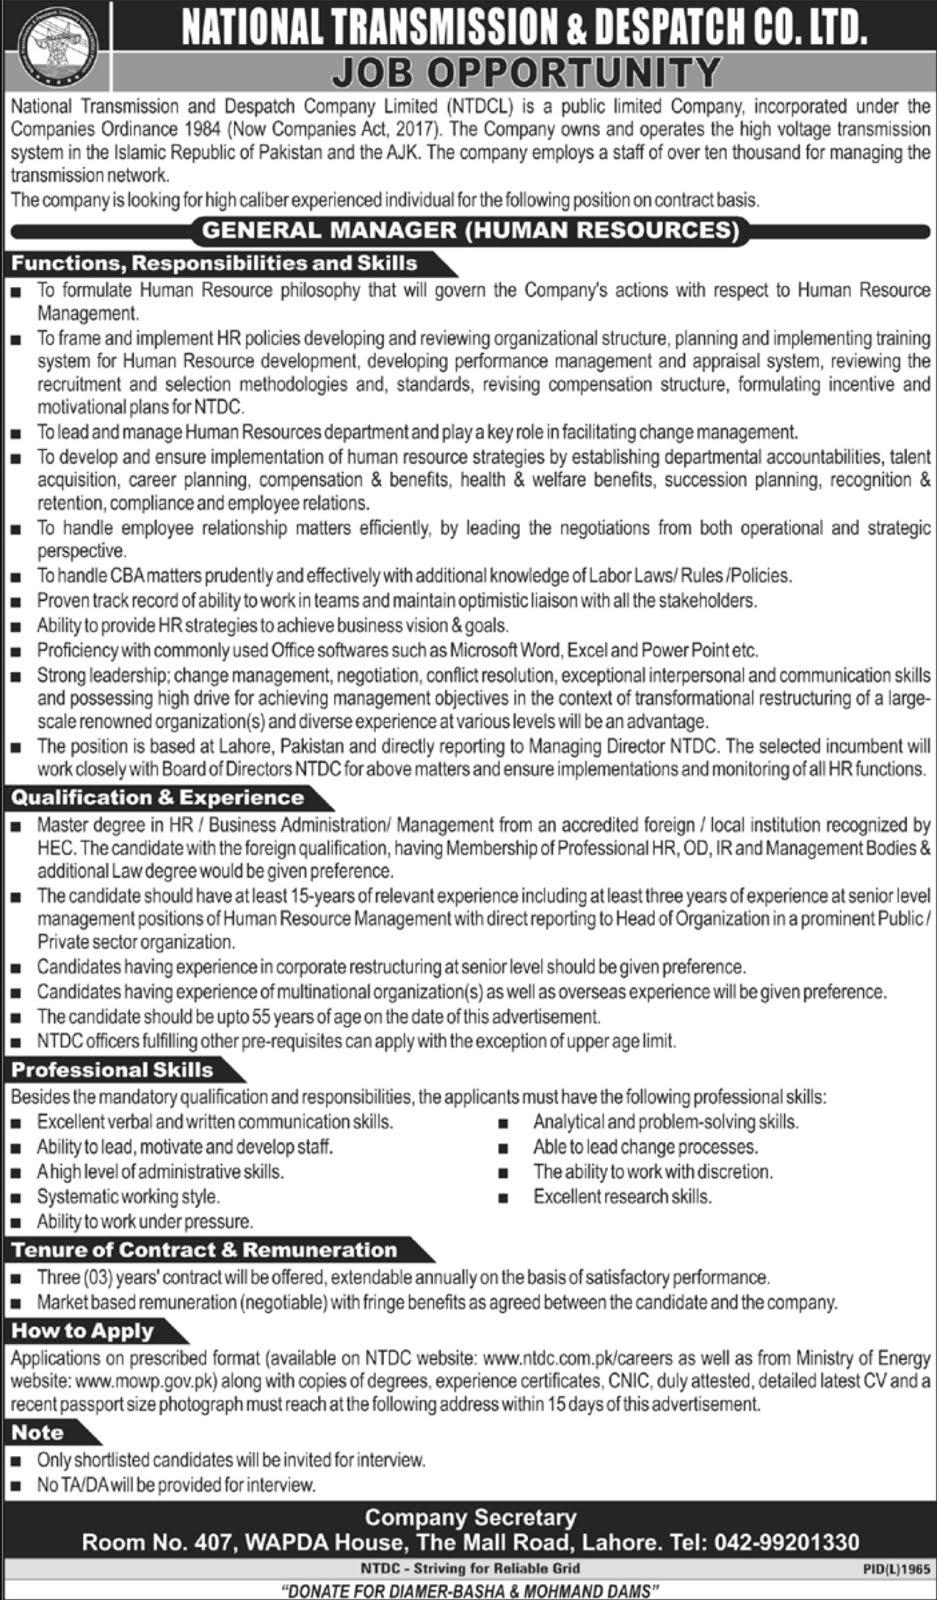 NTDC Wapda Jobs 2020 National Transmission & Despatch Co. Ltd